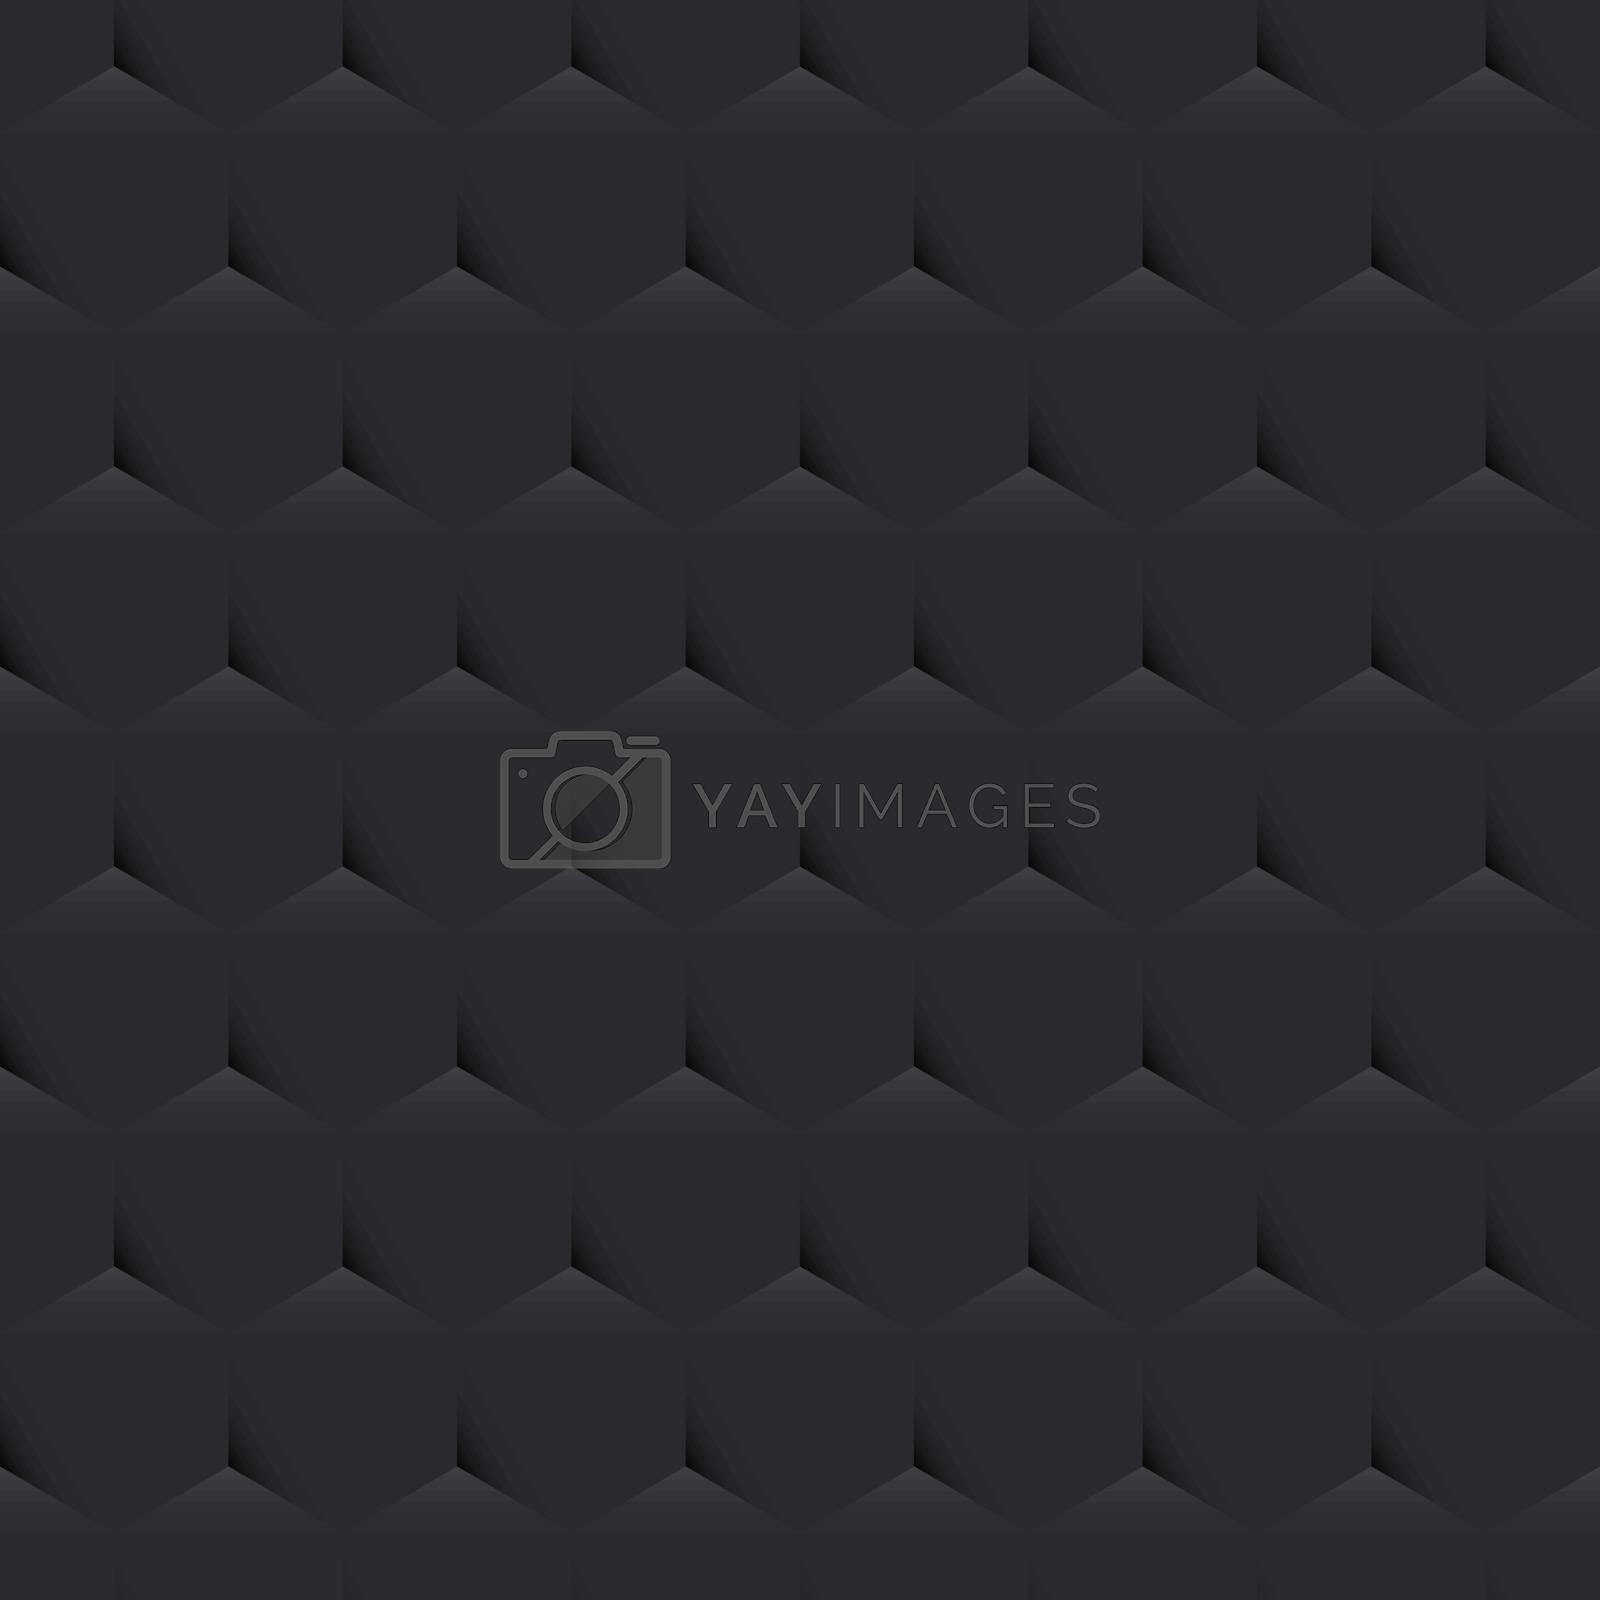 Dark Gray Mosaic Background, Creative Design Templates